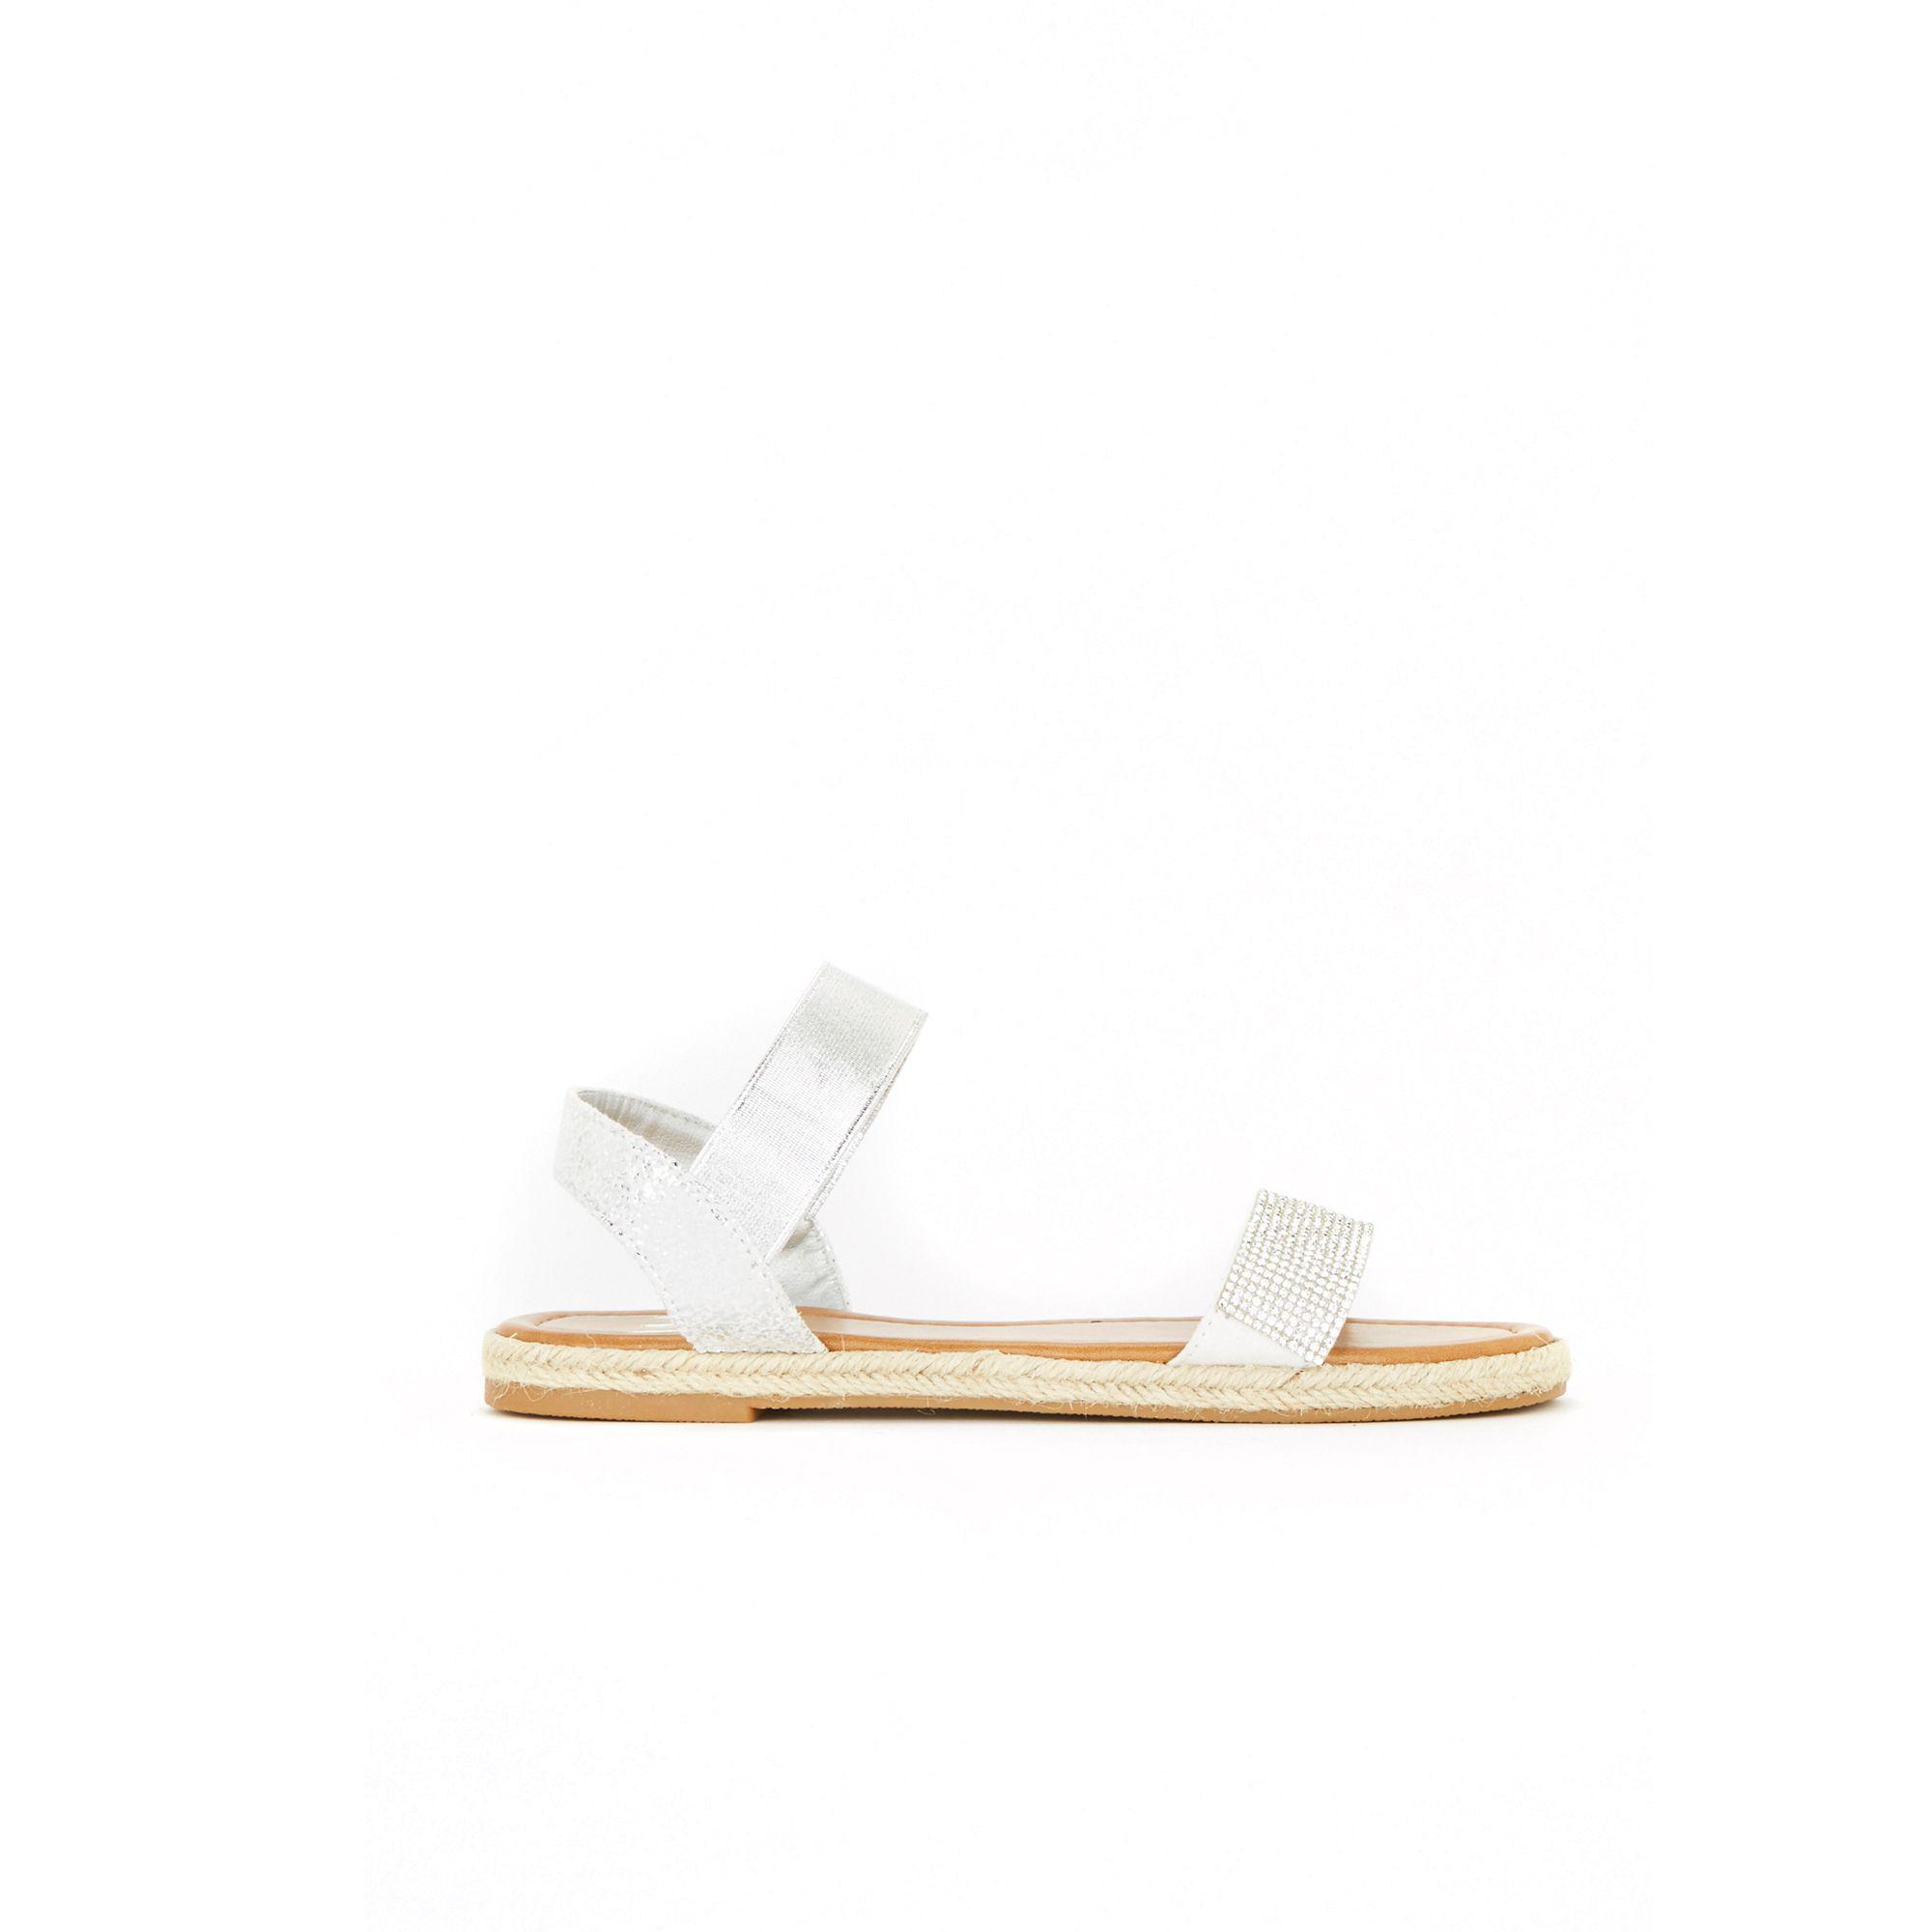 outlet marketable White diamante espadrille sandals cheap outlet store free shipping best cheap visit fashionable for sale TriDtl